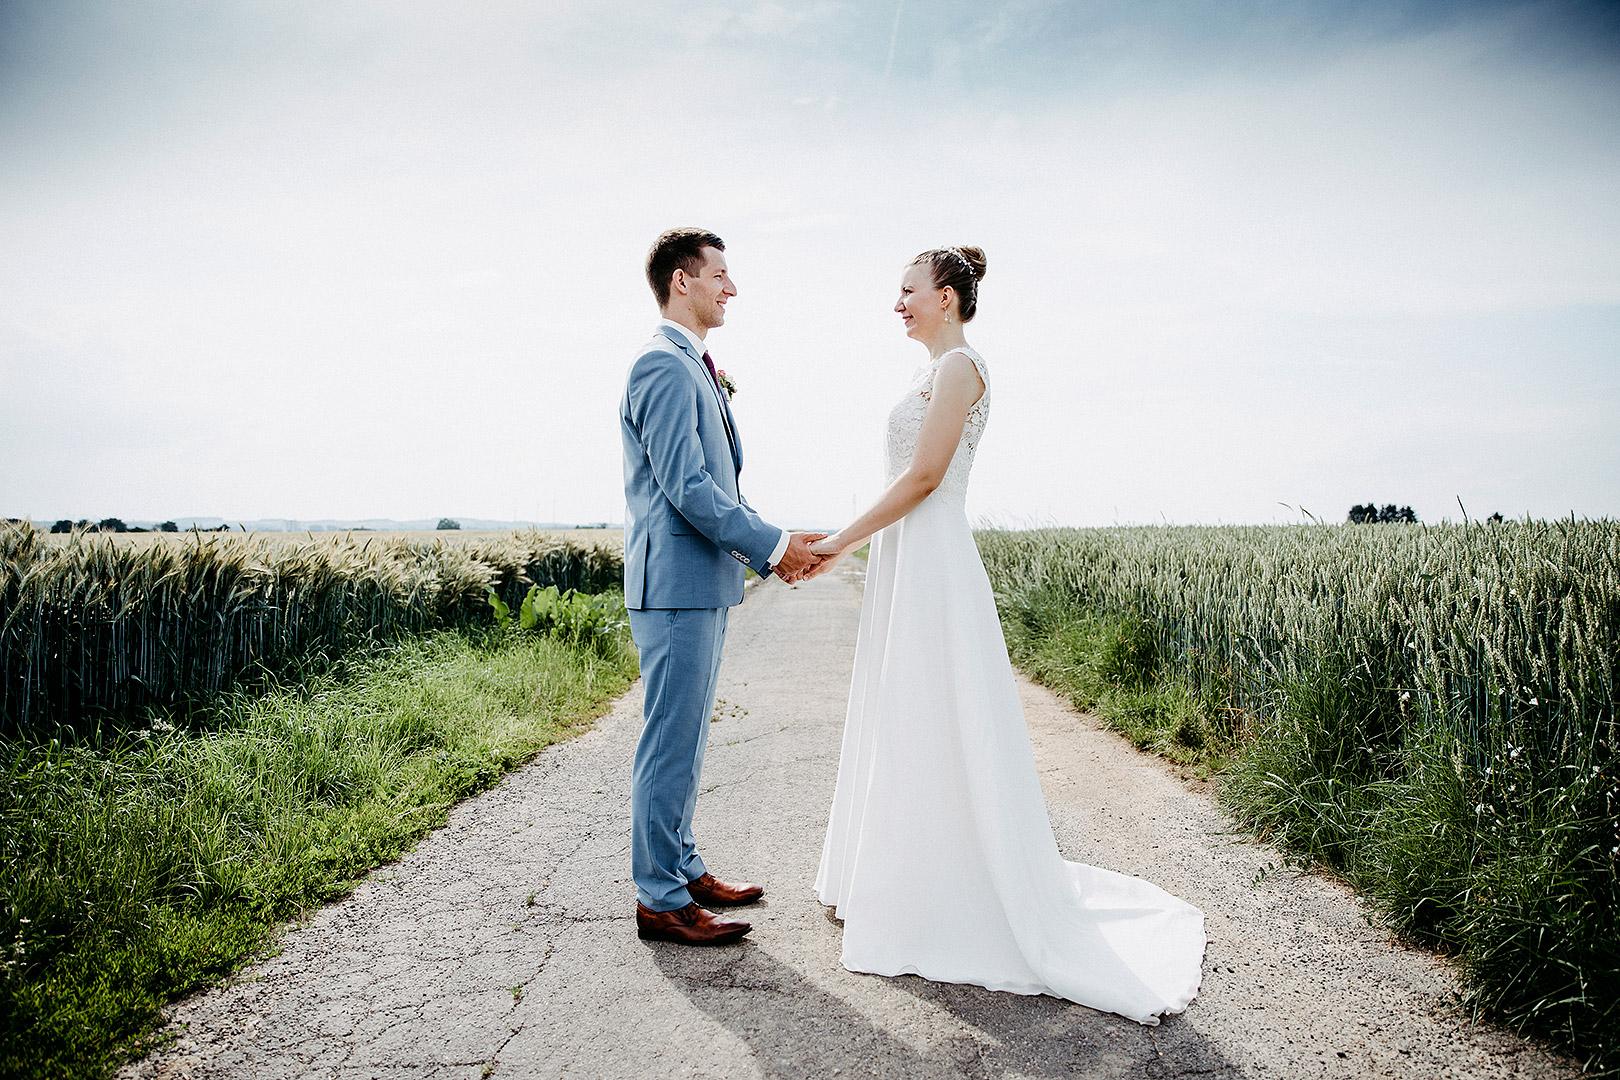 portrait_wedding_stefanieundsven_34